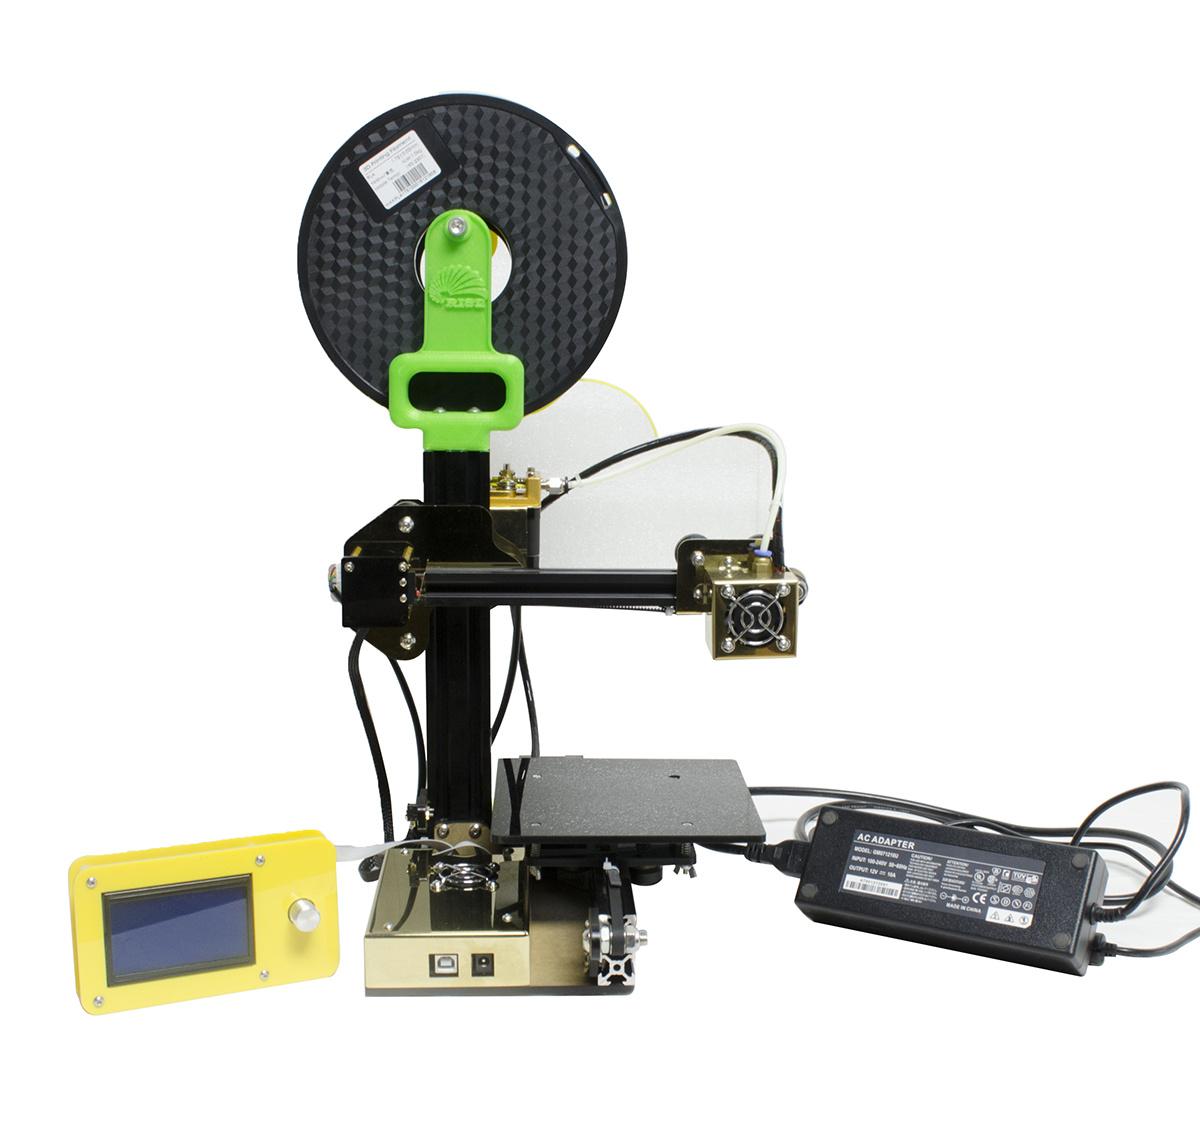 2017 Mini Portable Rapid Prototype Fdm Desktop DIY 3D Printer